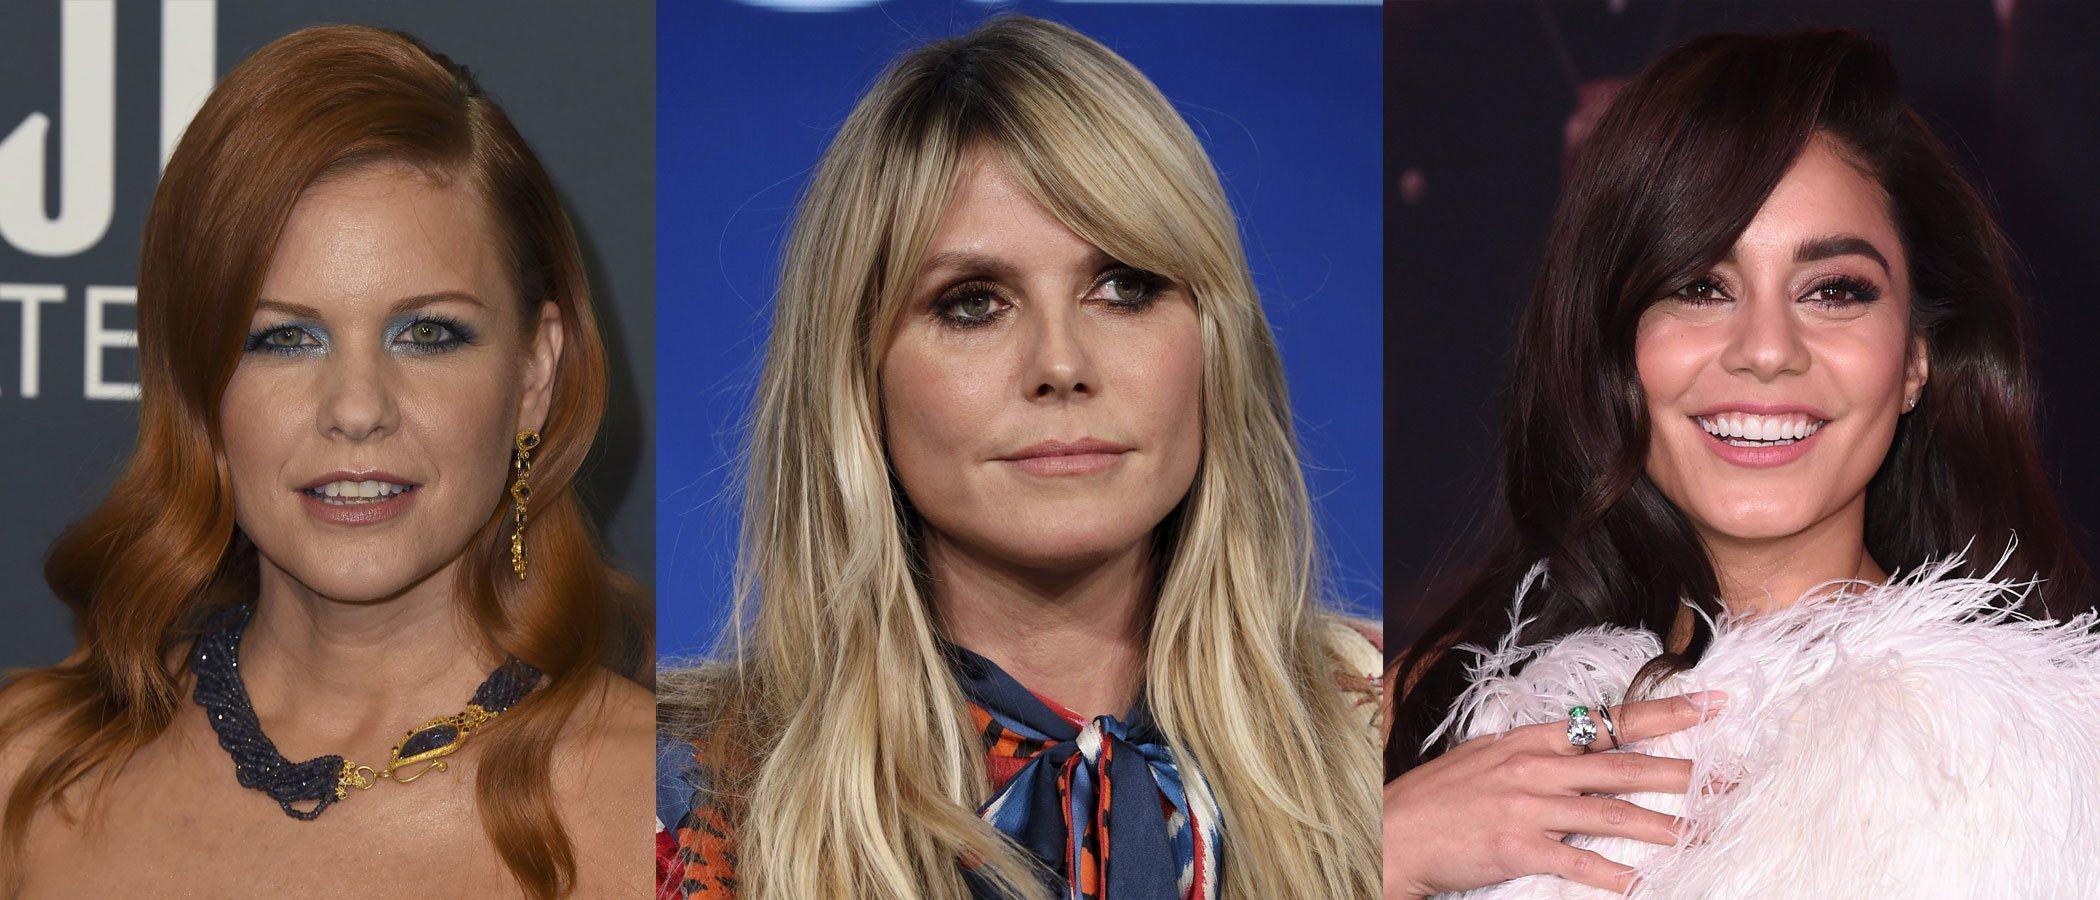 Heidi Klum y Vanessa Hudgens protagonizan los peores beauty looks de la semana